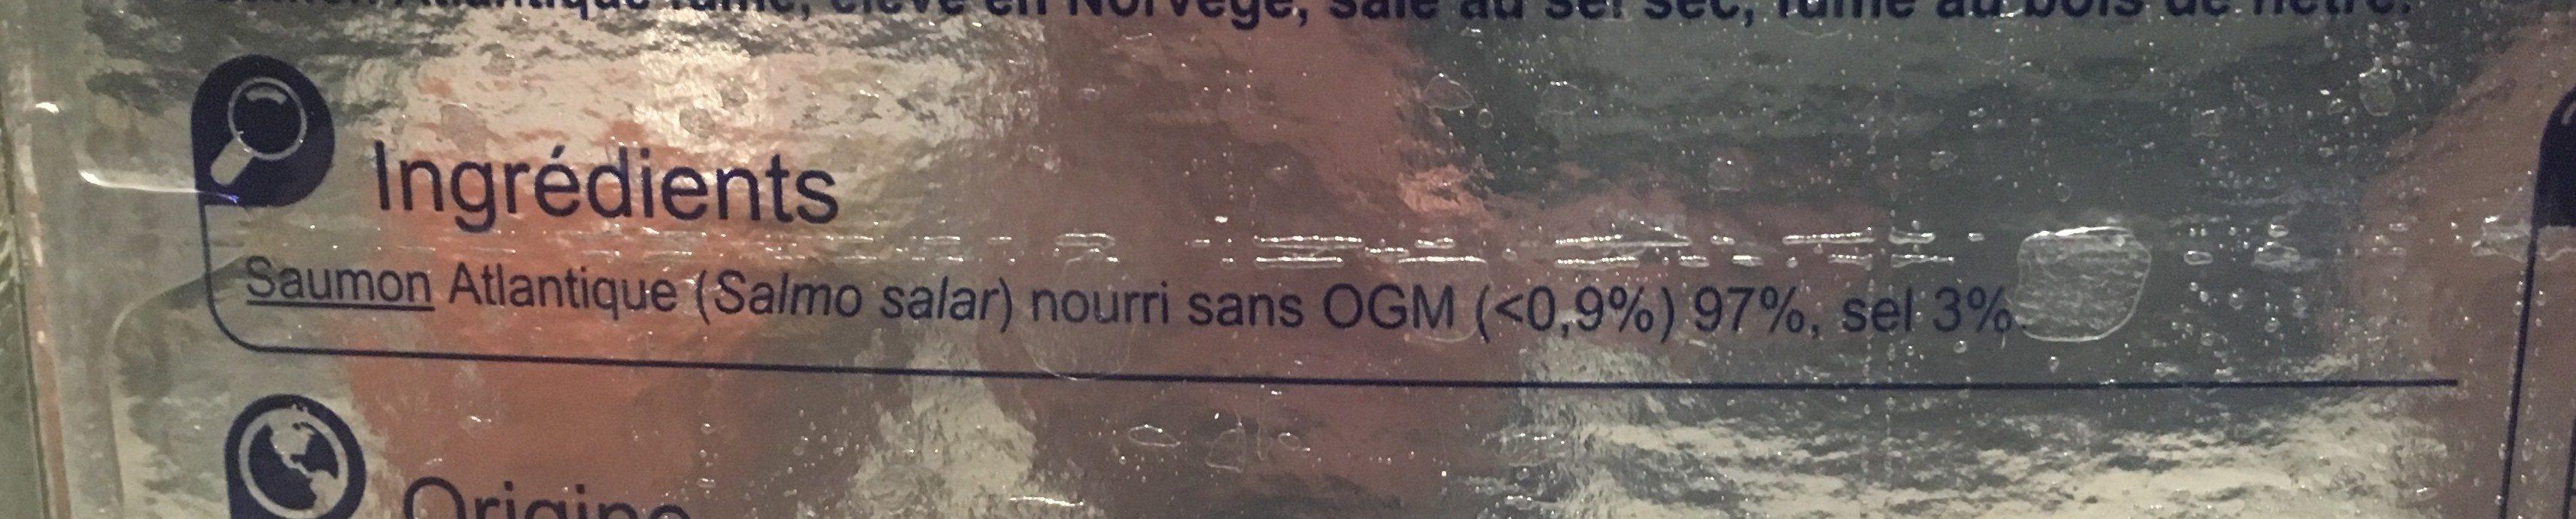 Saumon fumé norvege - Ingrediënten